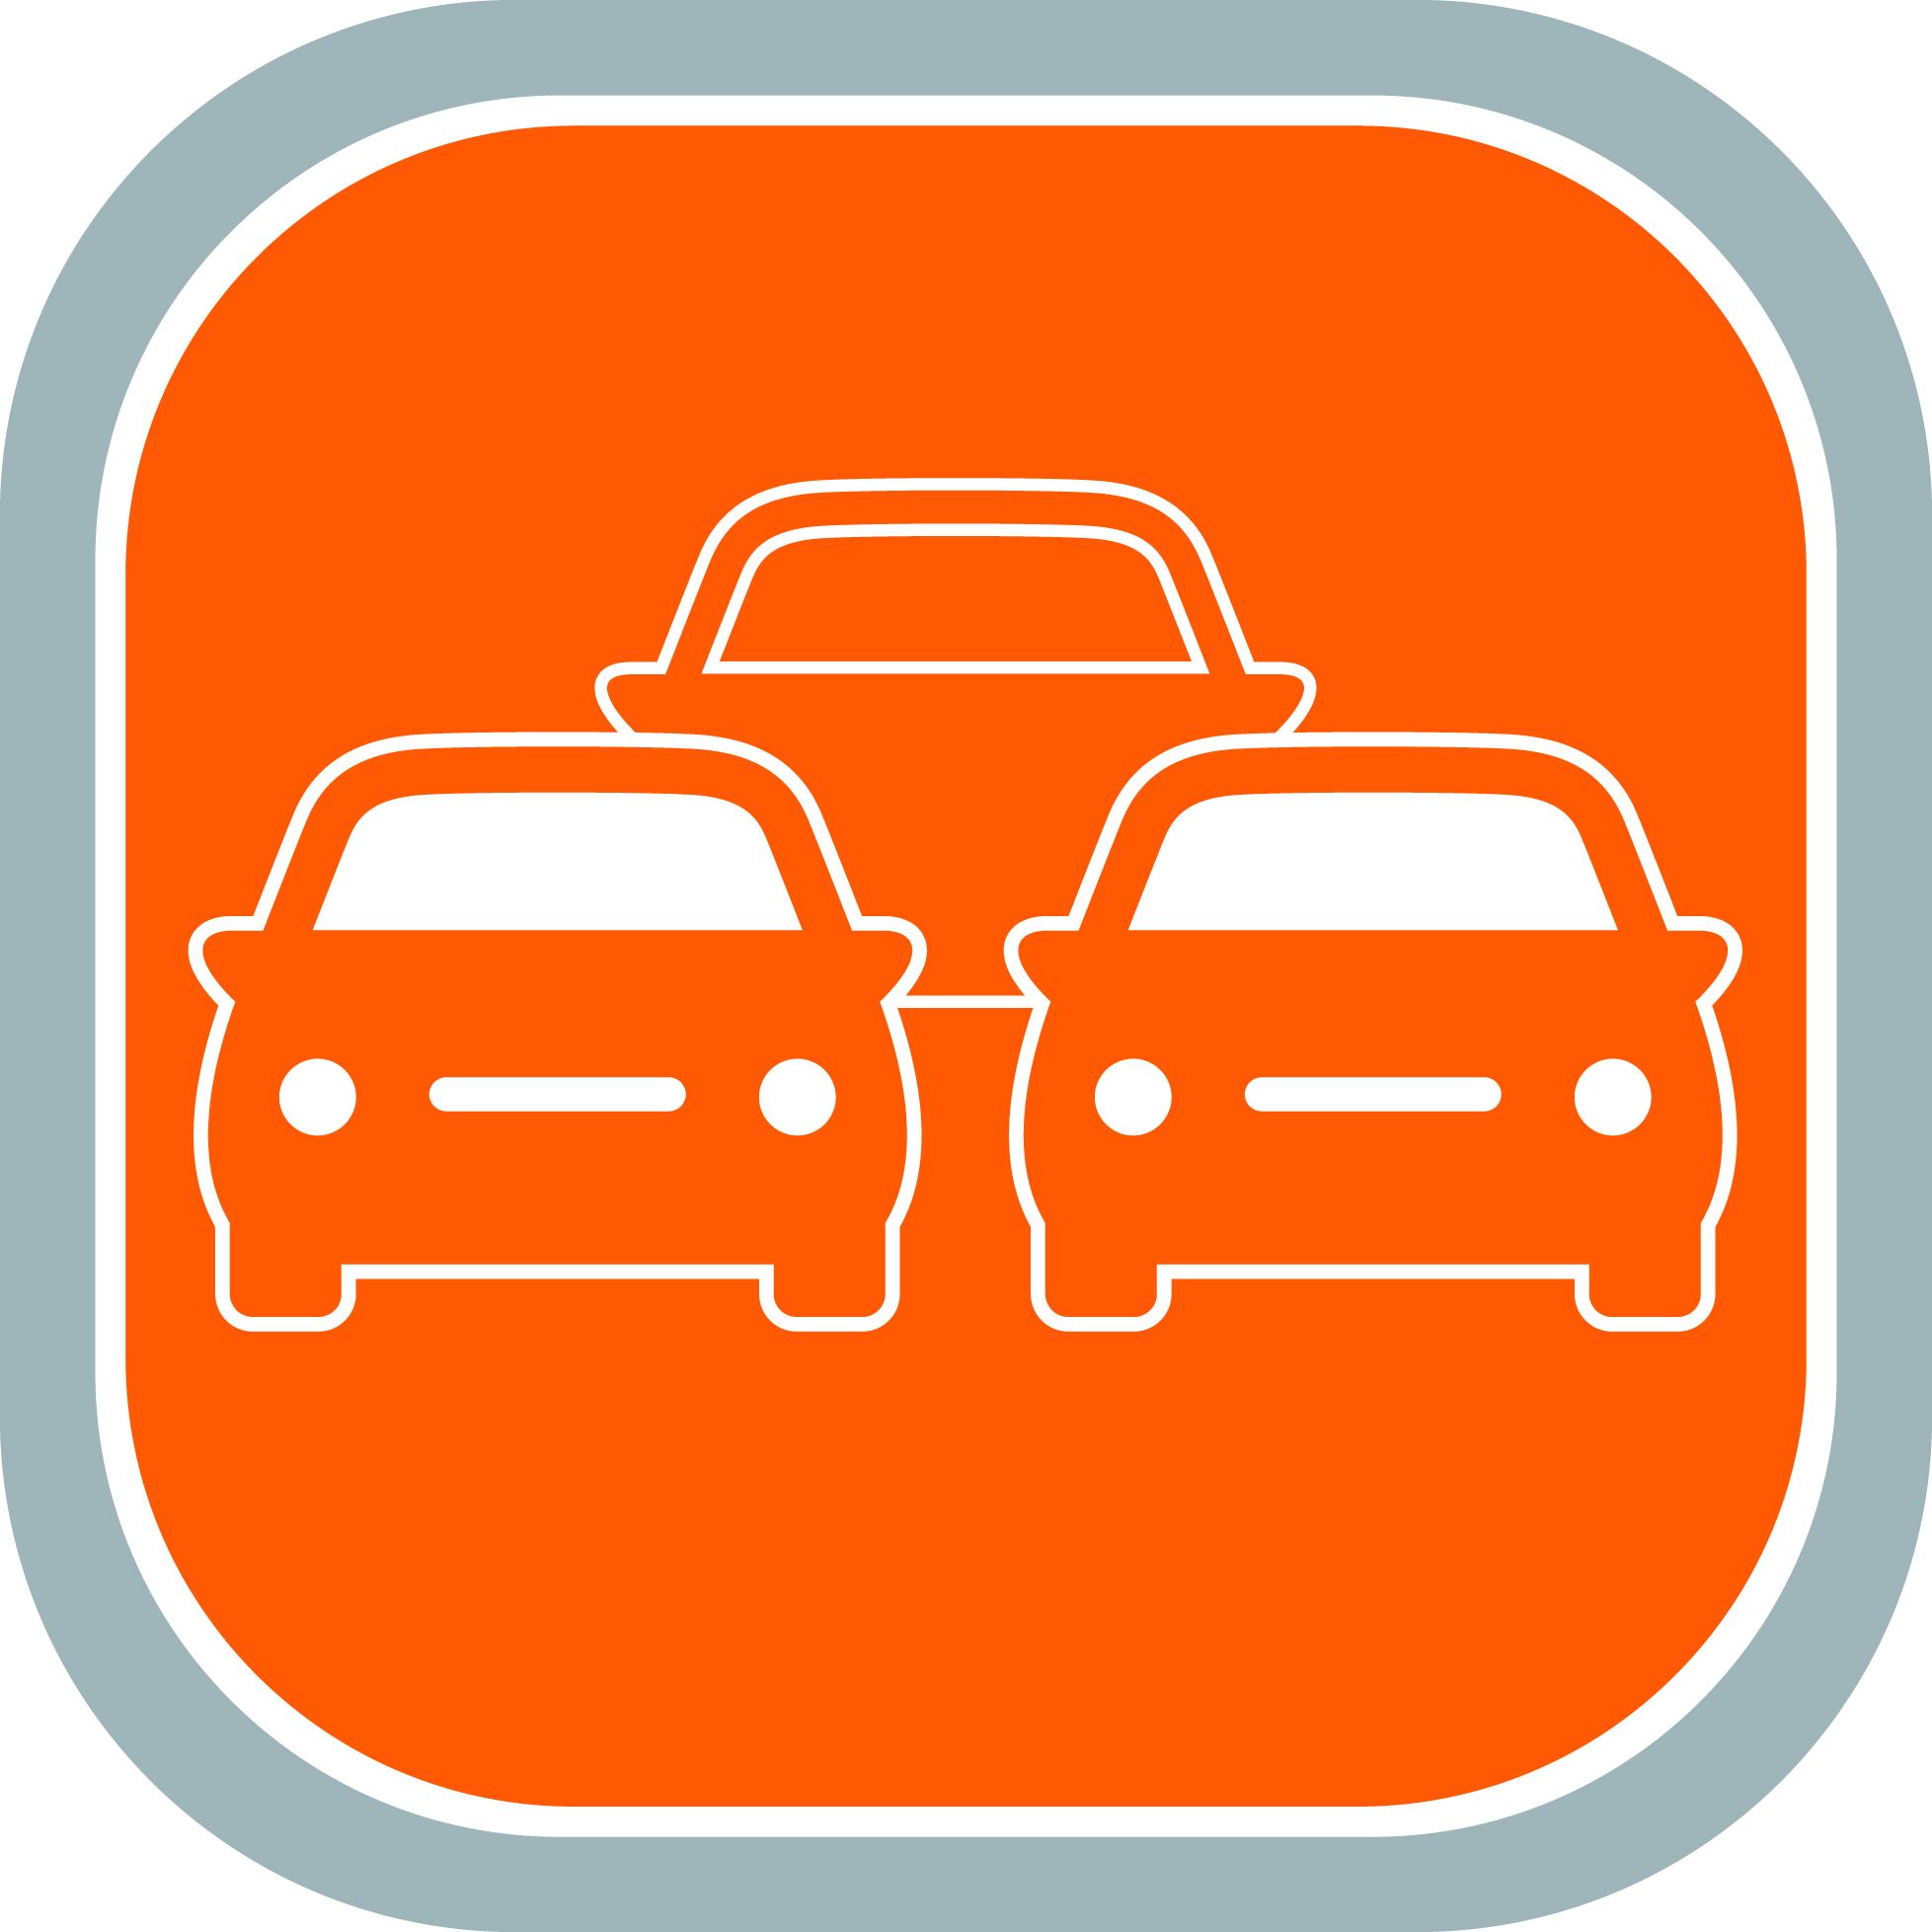 Správa vozového parku logo